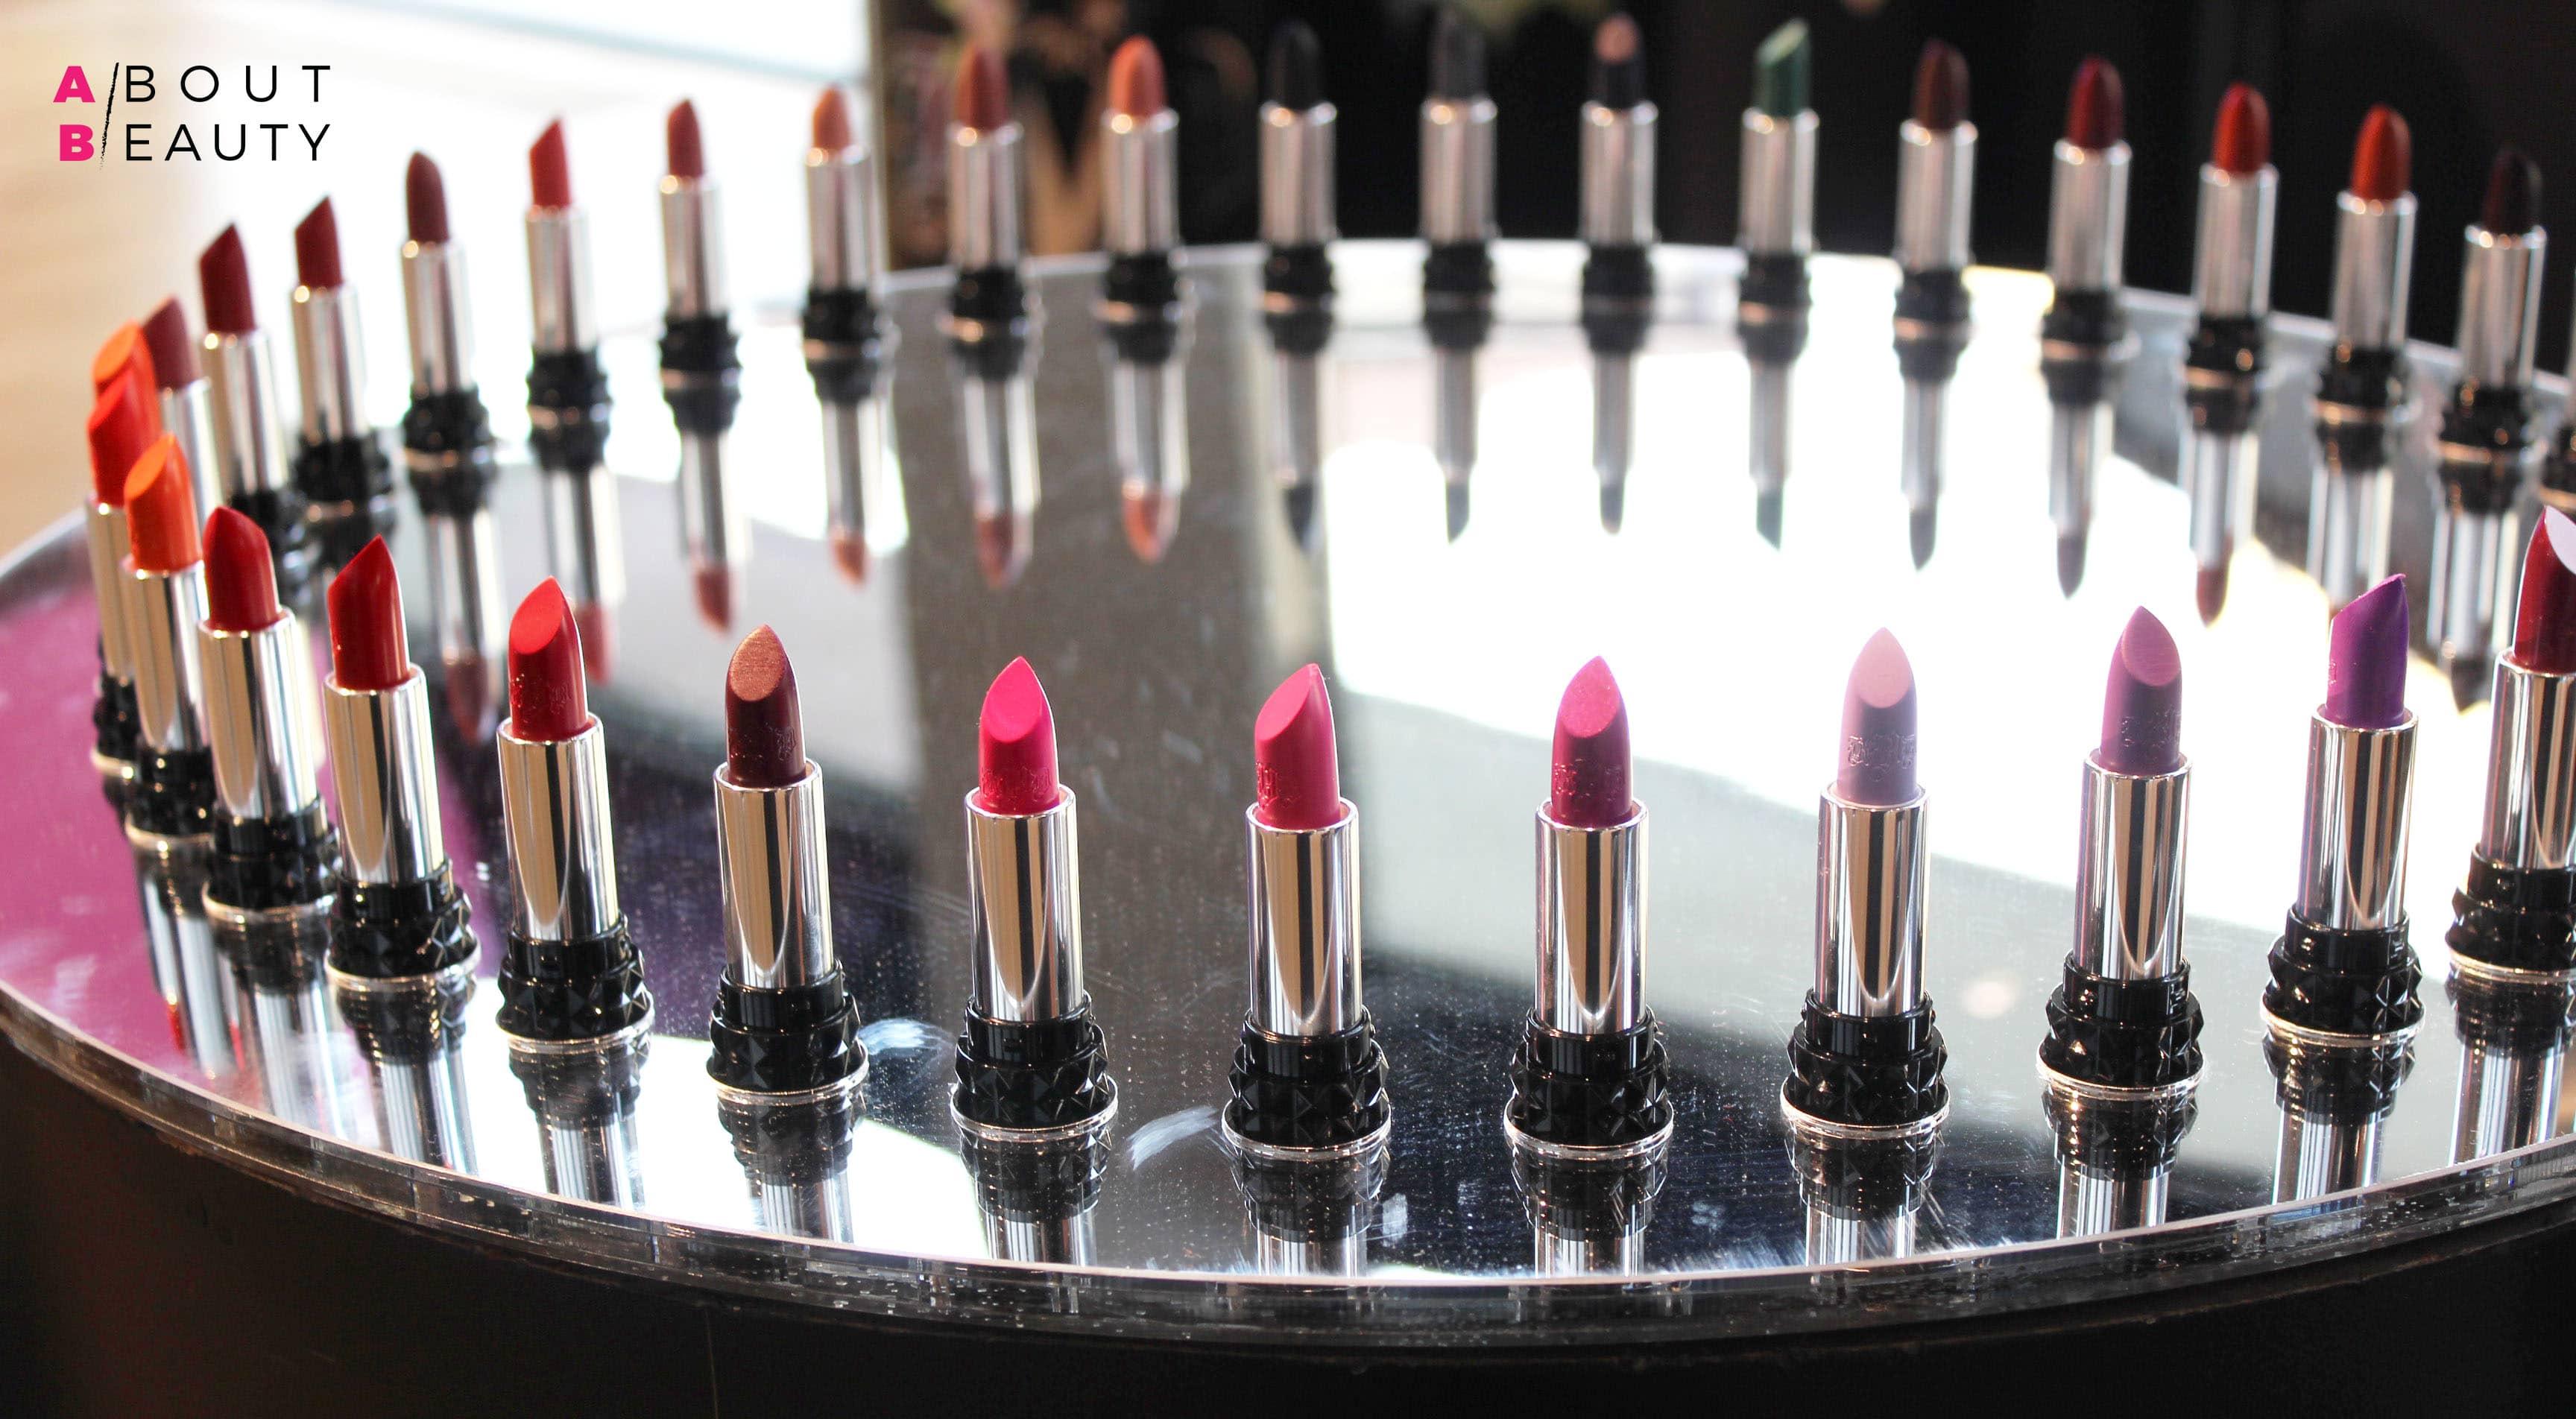 Kat Von D, tutti i prodotti per il trucco labbra in arrivo da Sephora - Studded Kiss Lipstick